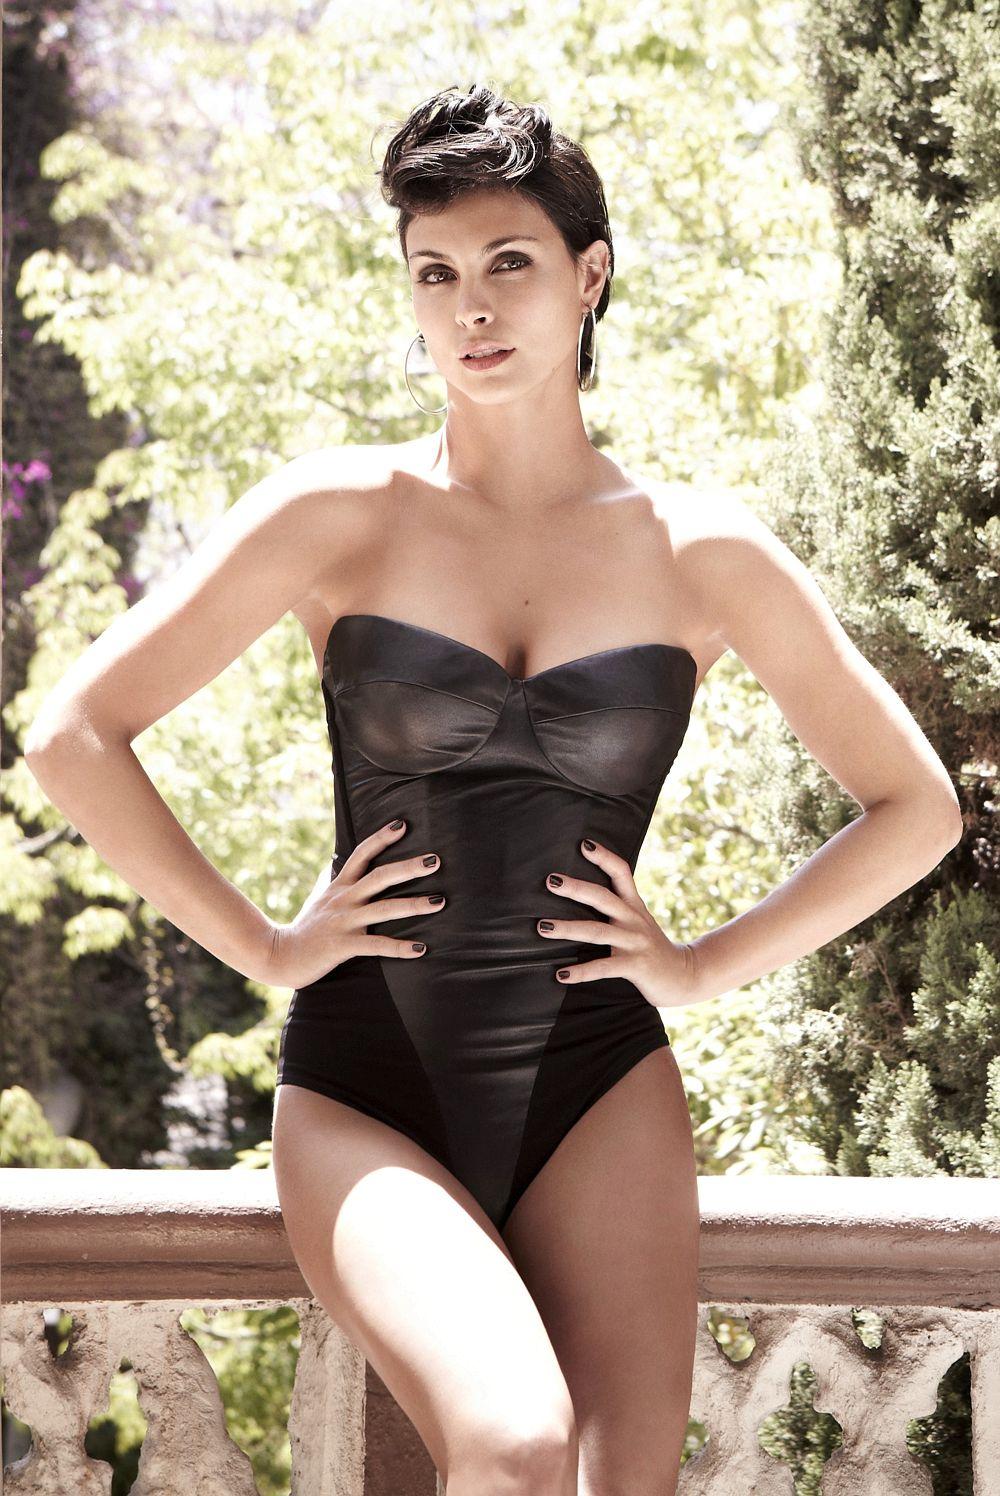 Morena Baccarin Bikini Nude Photos 32